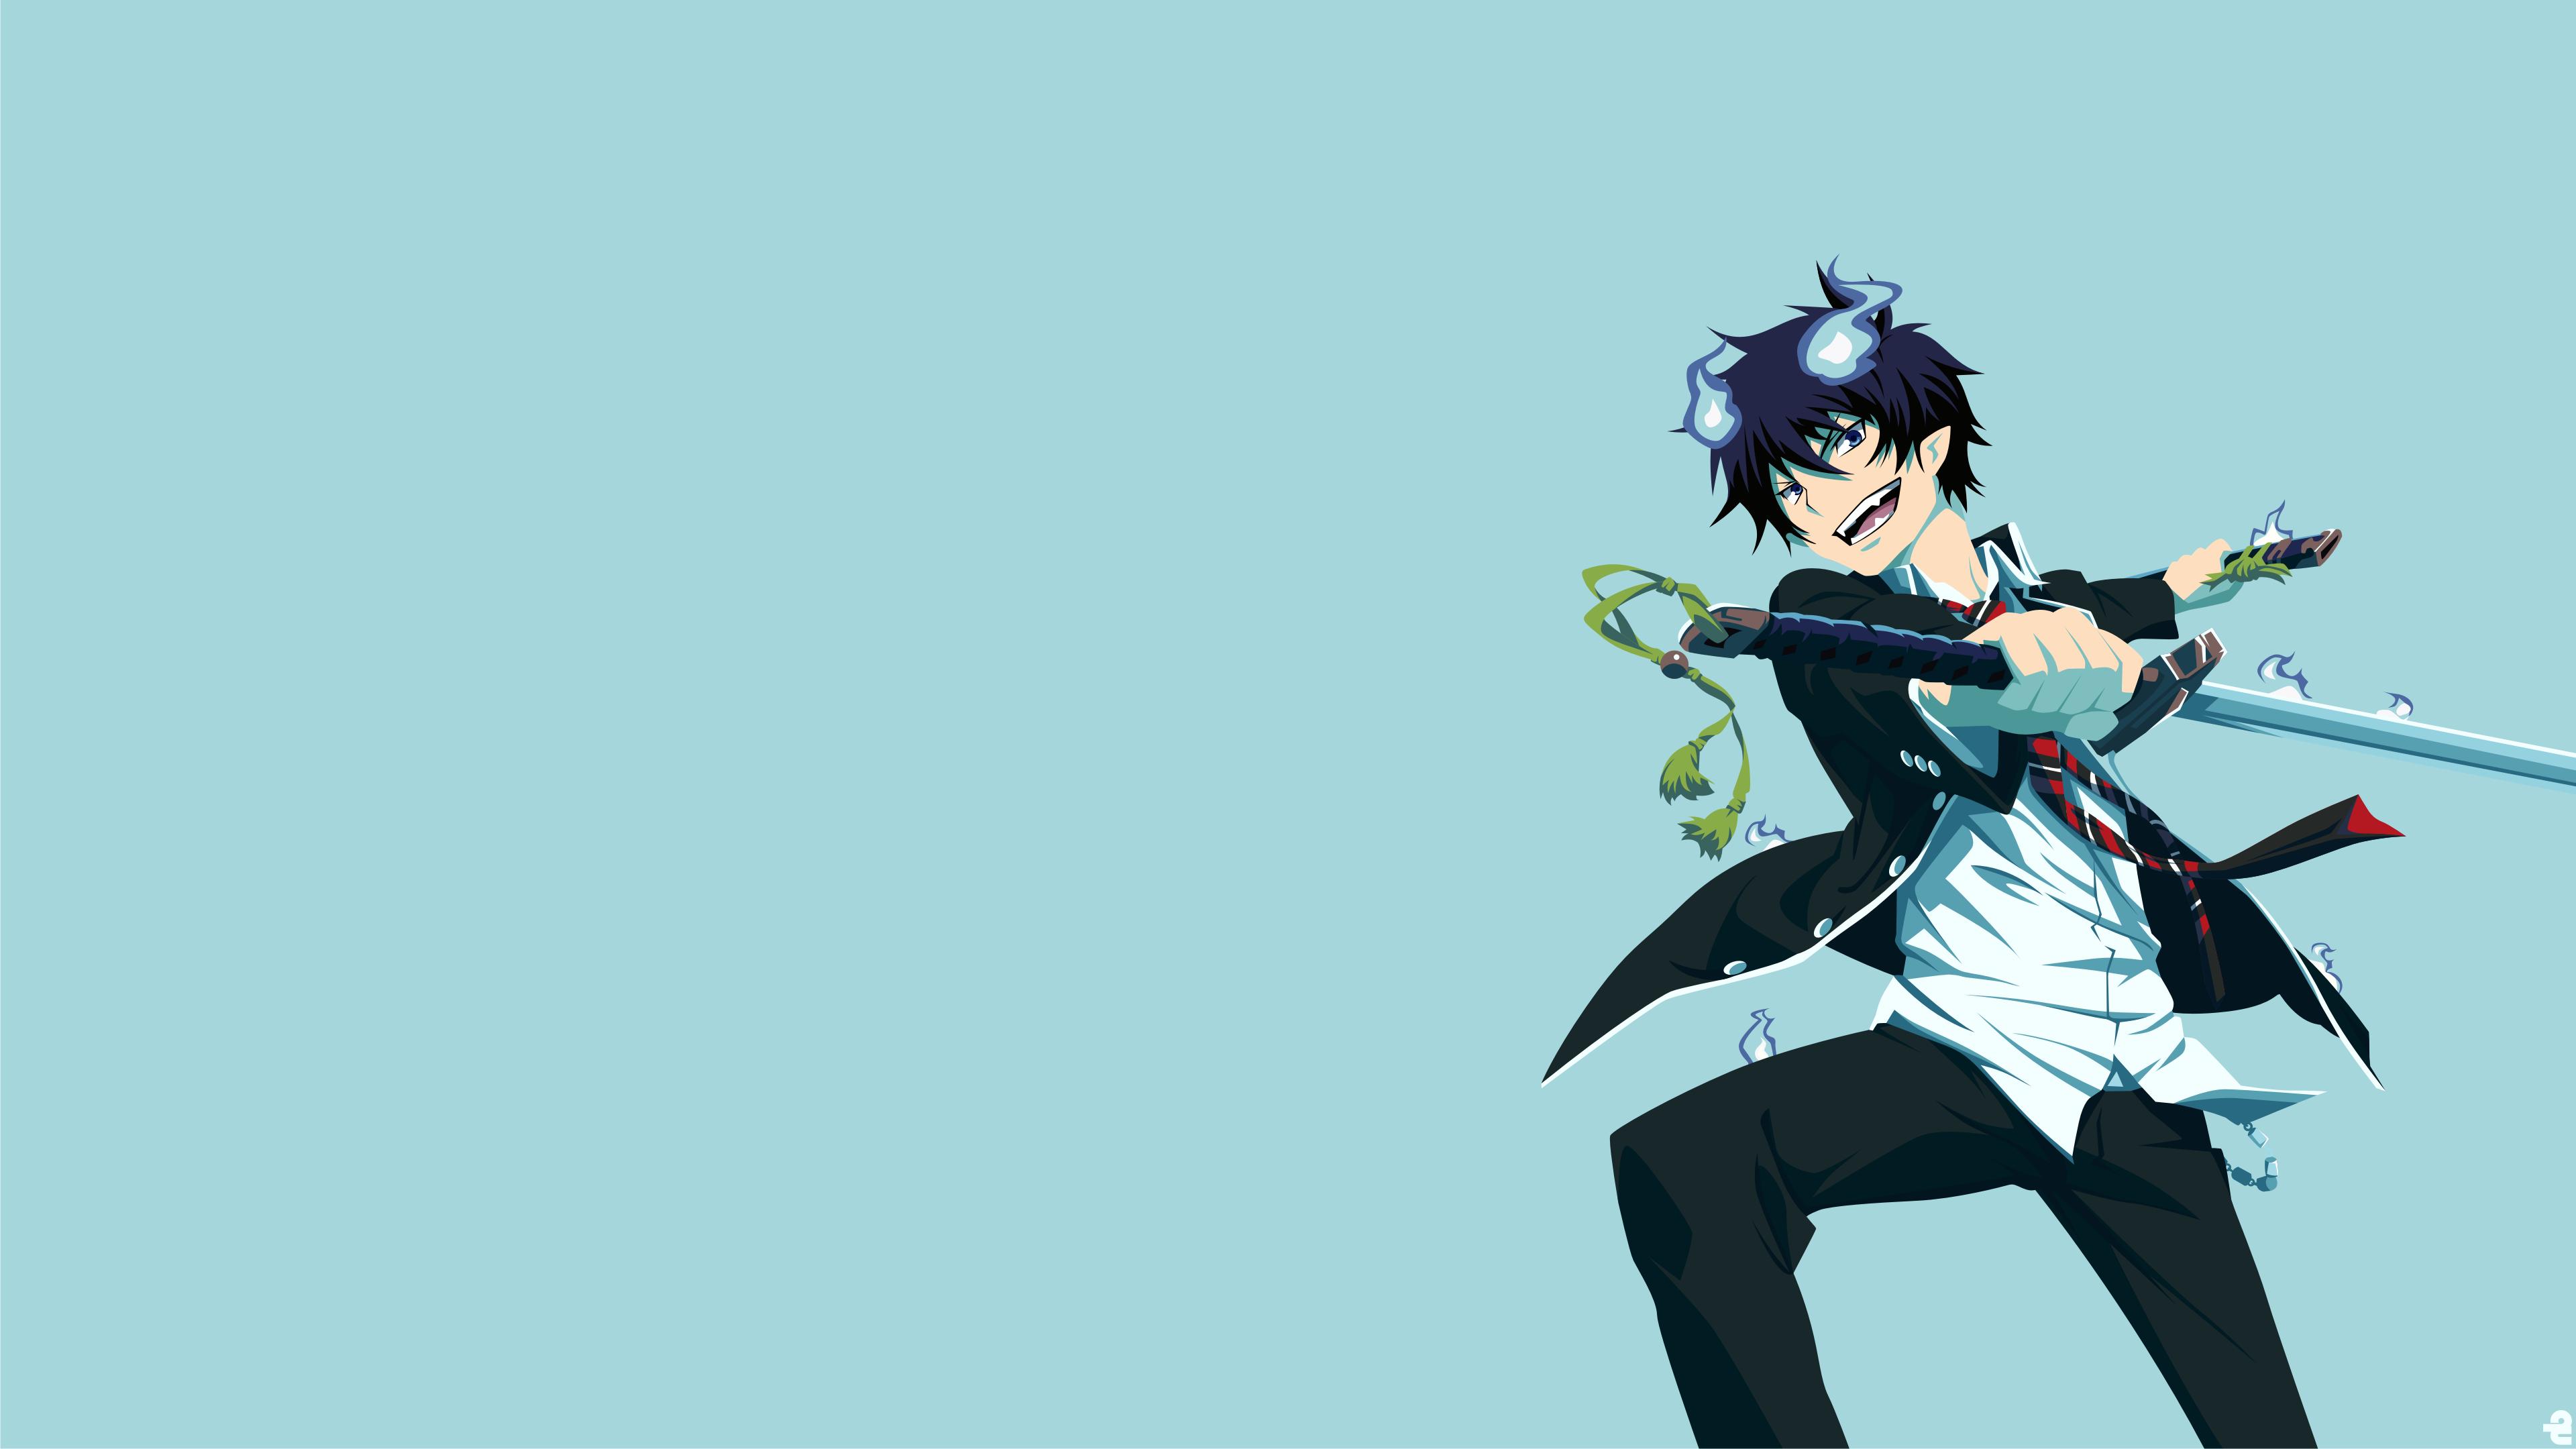 Wallpaper Blue Exorcist Okumura Rin 3840x2160 Hanako 1384463